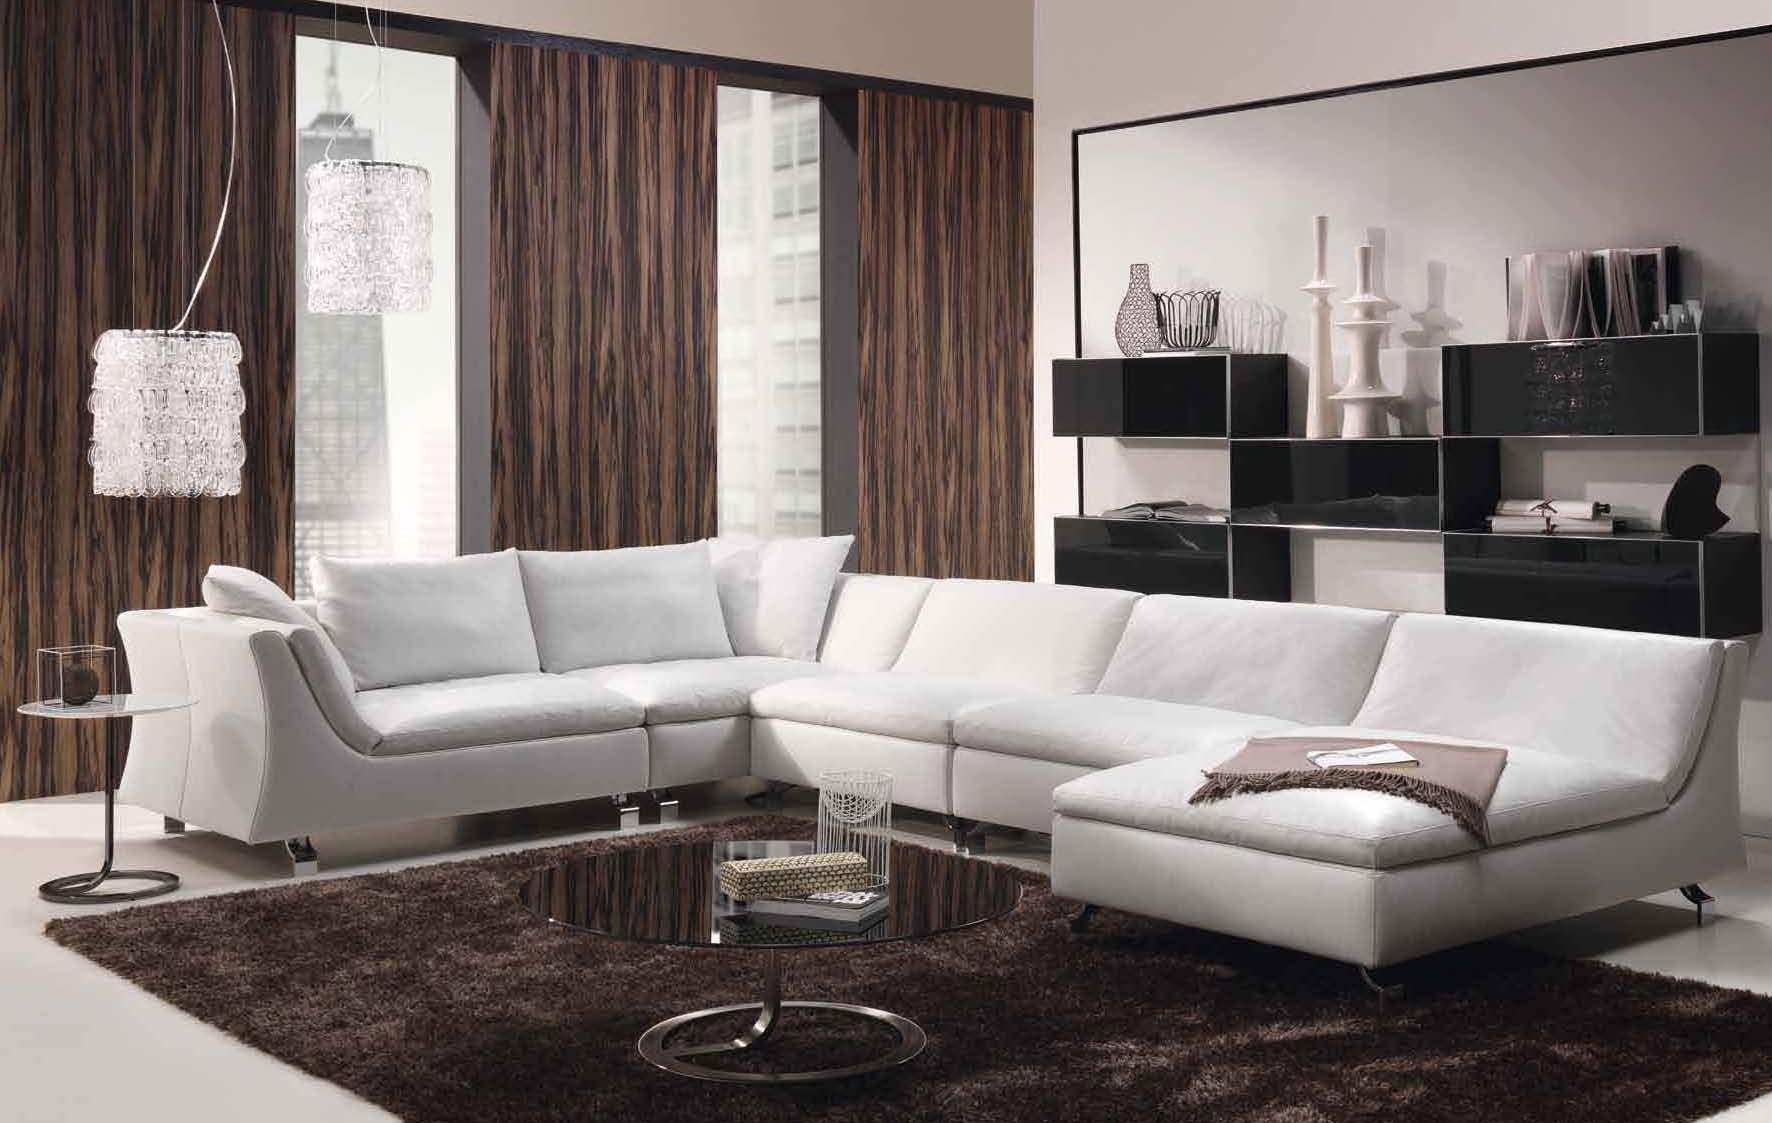 14-modern-furniture-ideas